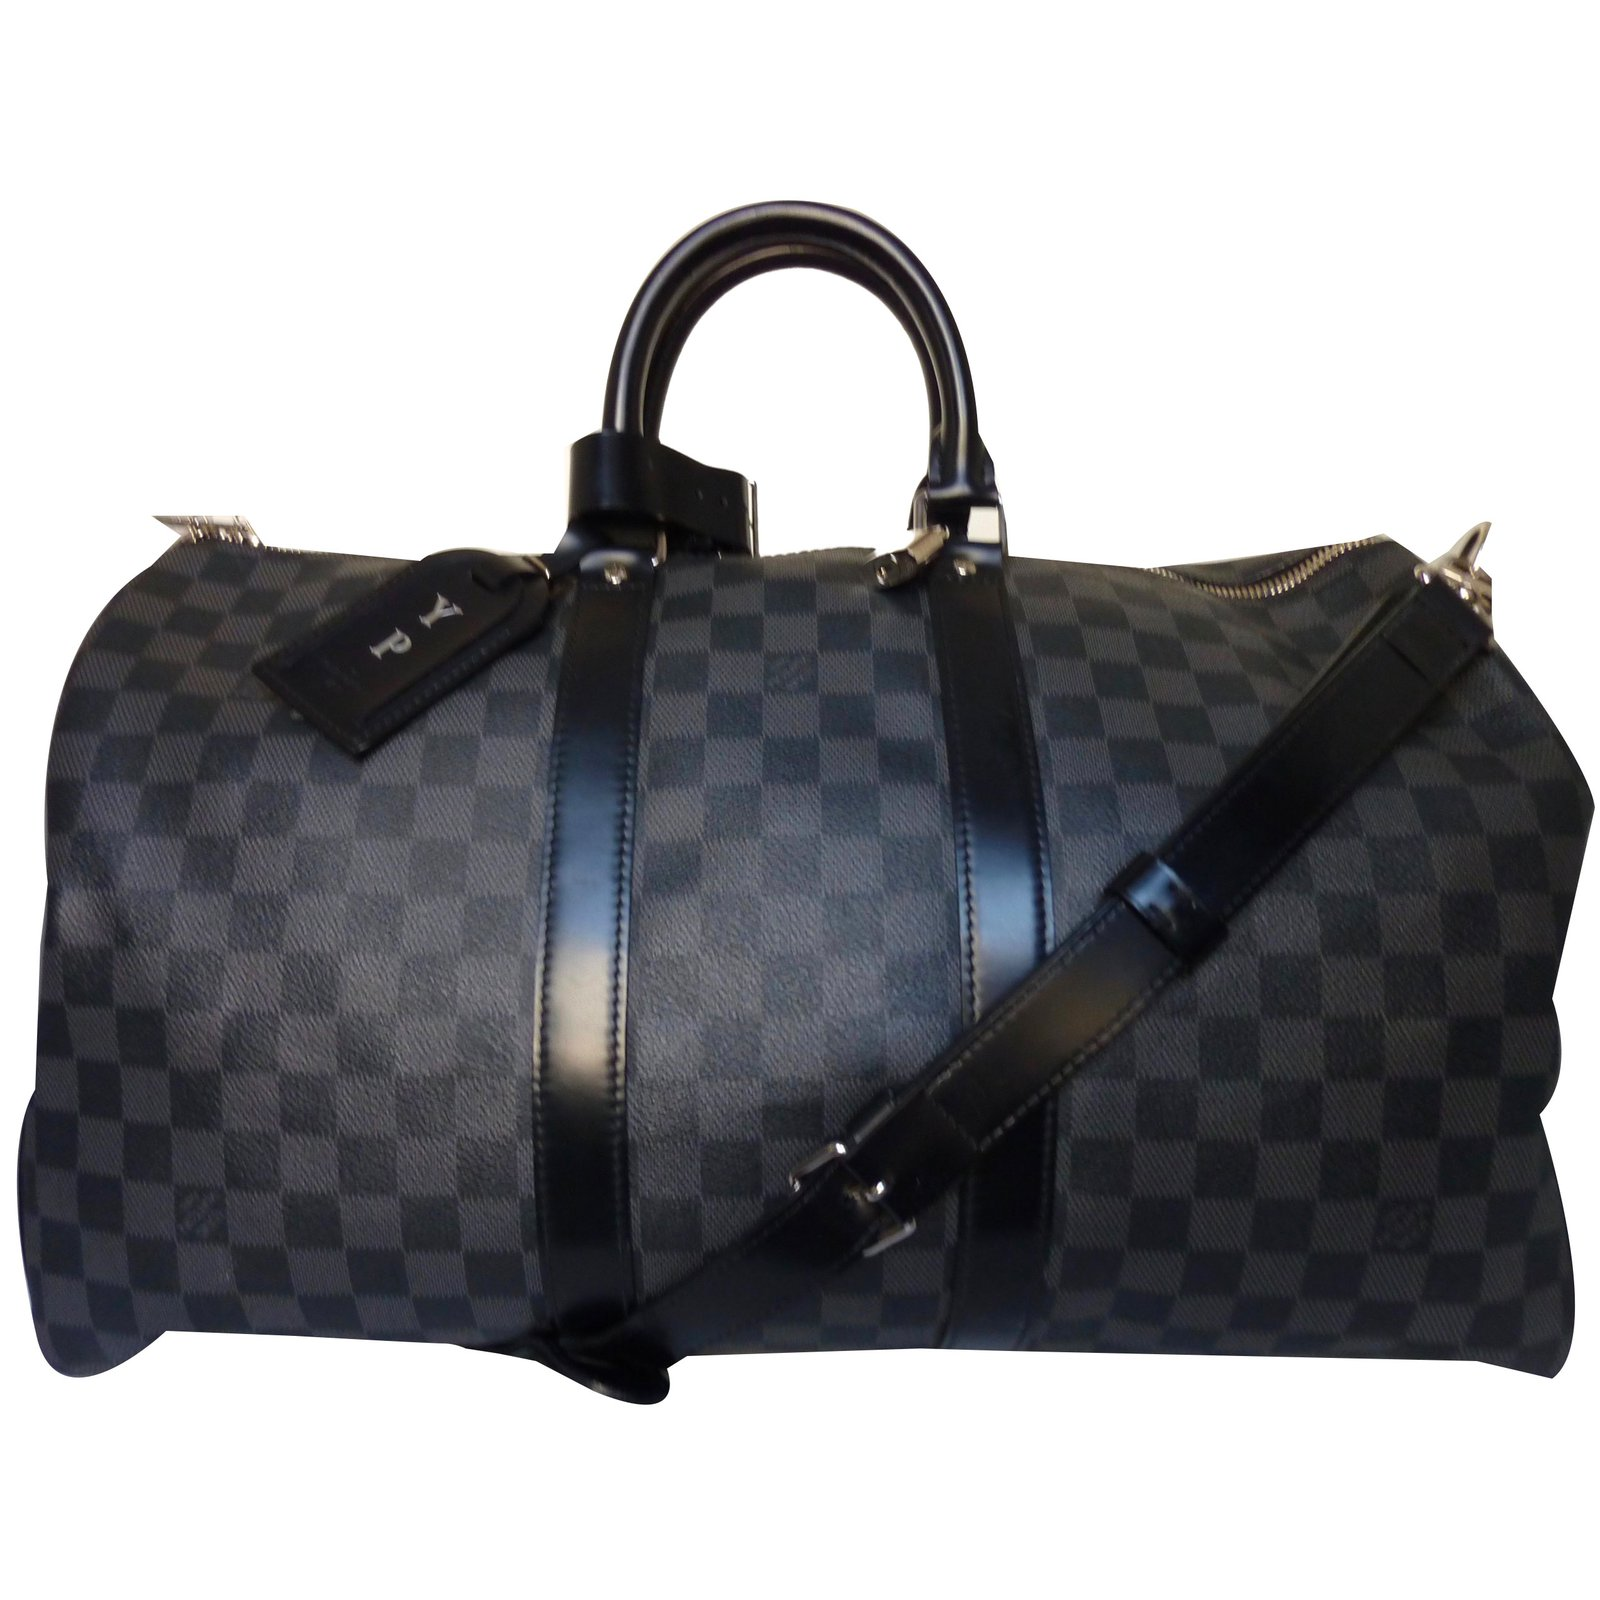 ad6c9937a26 Sacs de voyage Louis Vuitton Keepall 45 Cuir